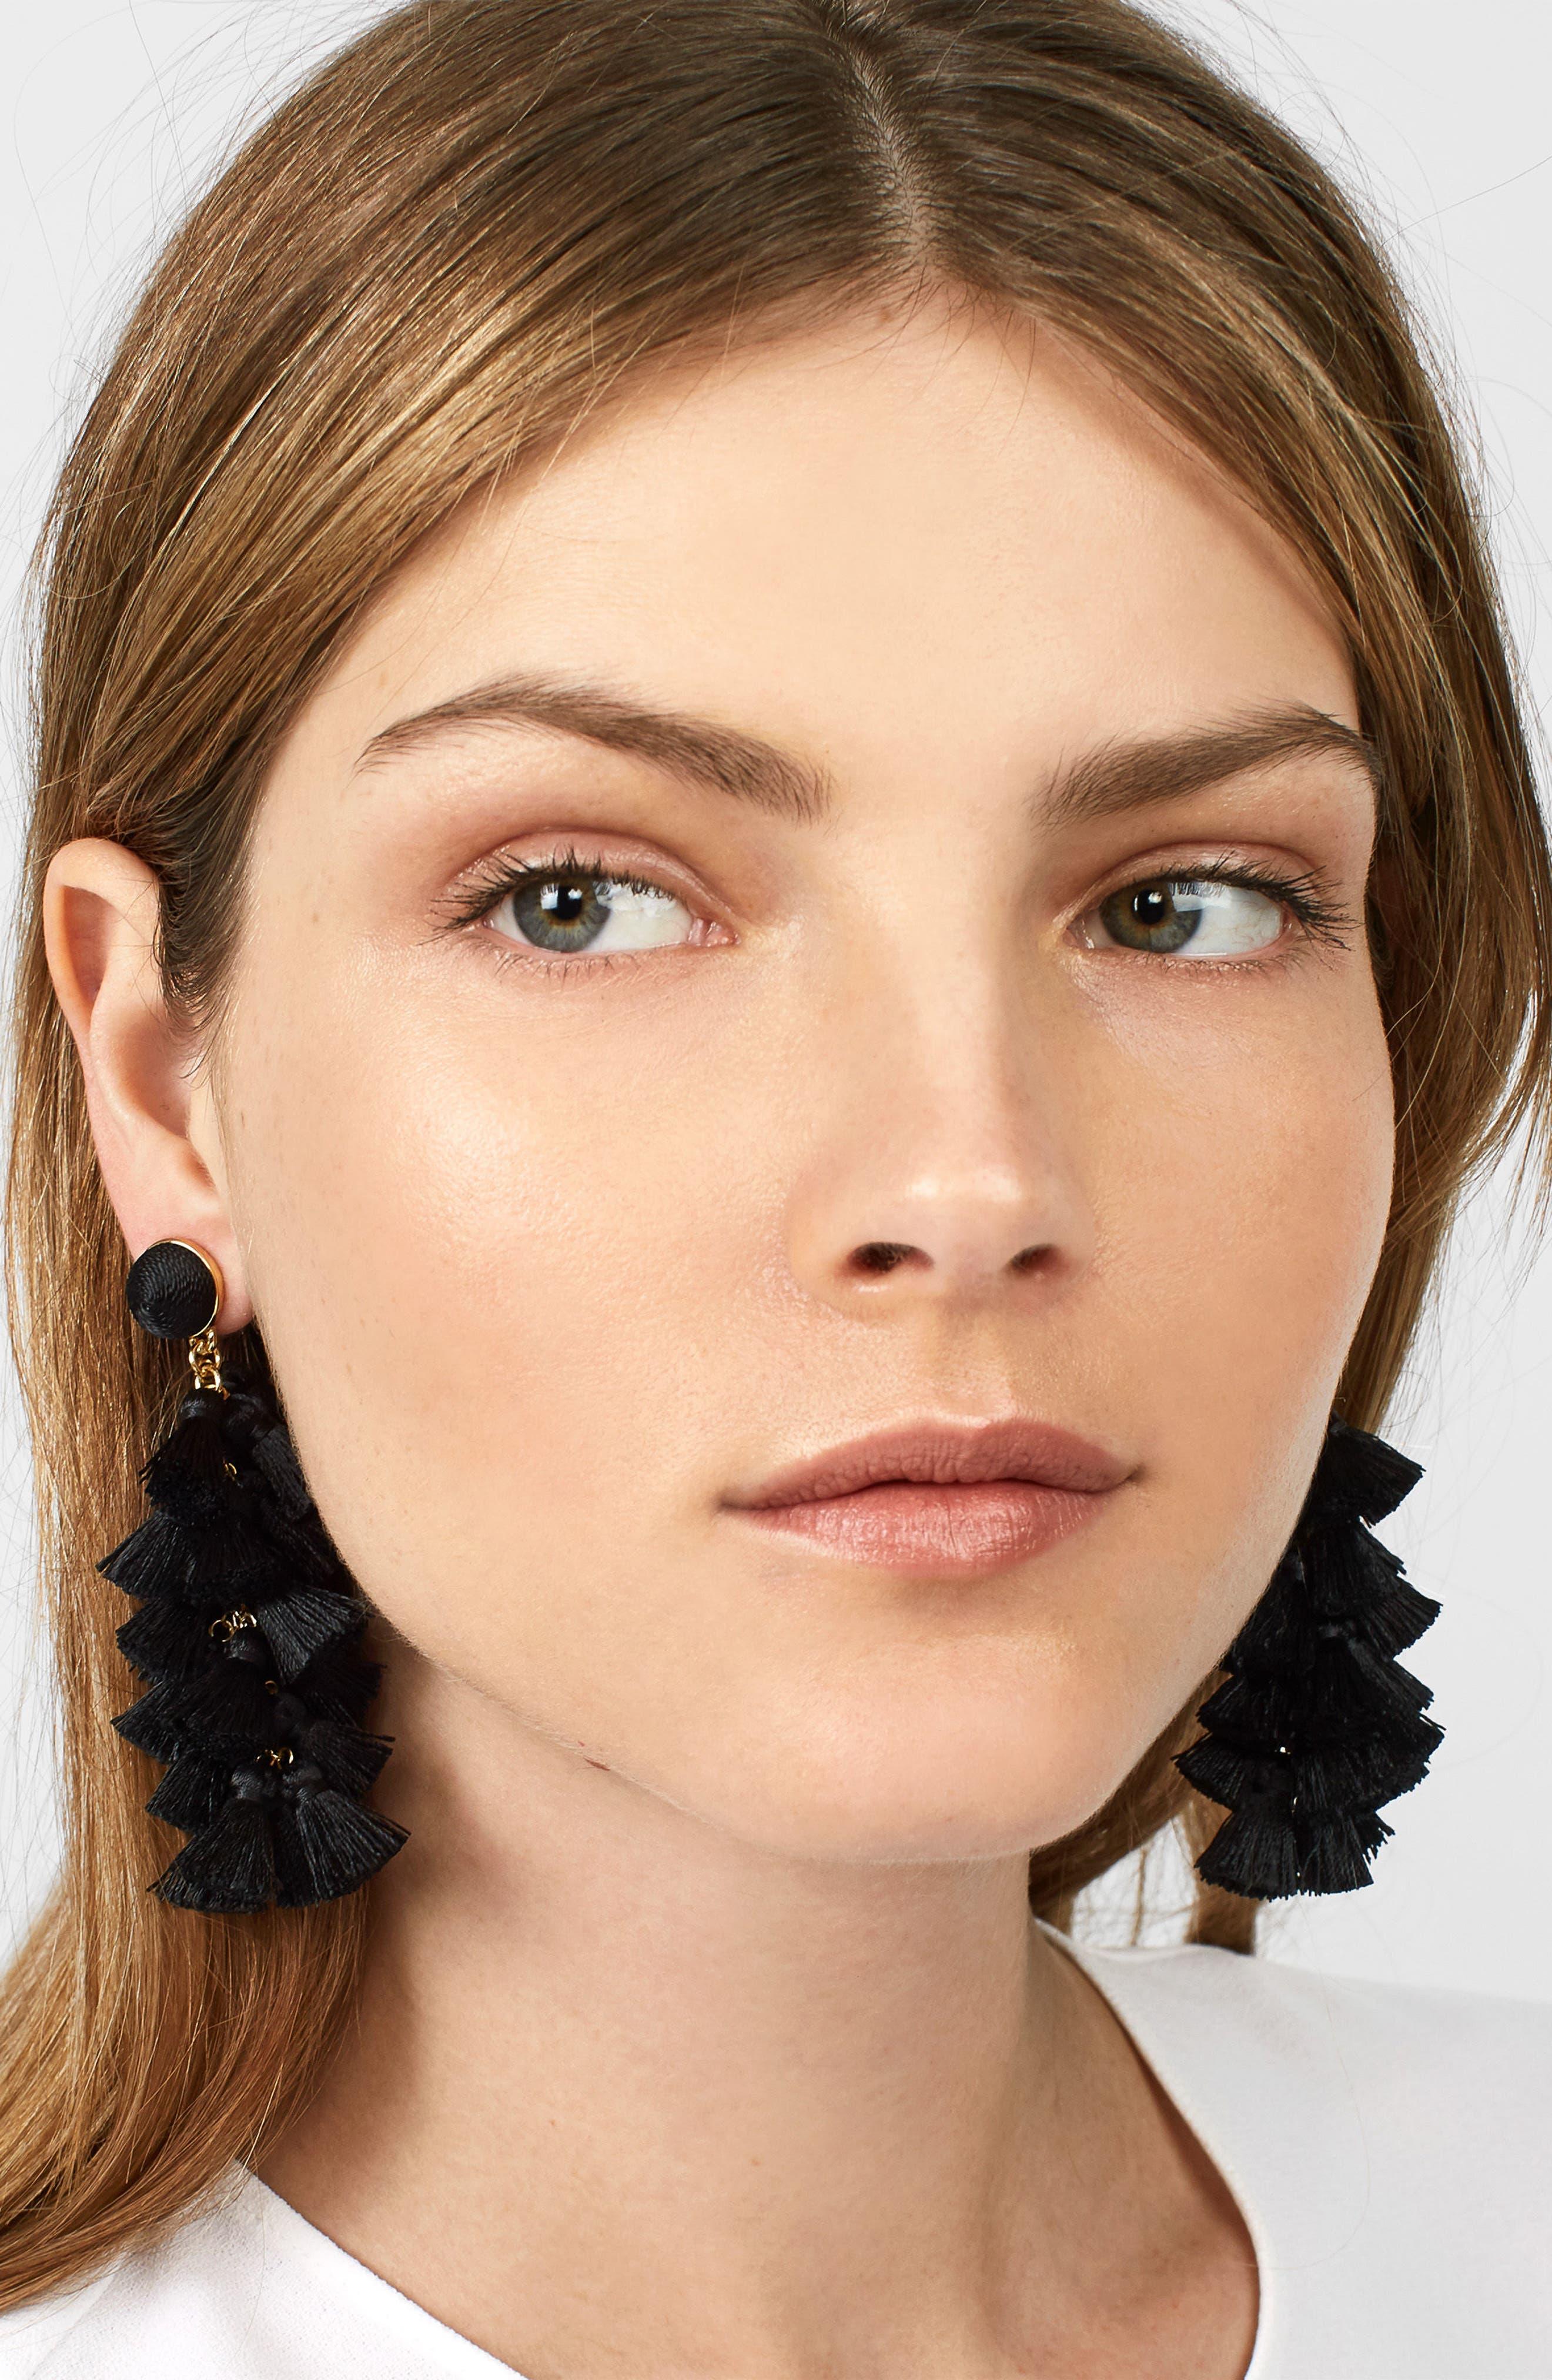 Contessa Tassel Earrings,                             Alternate thumbnail 2, color,                             BLACK